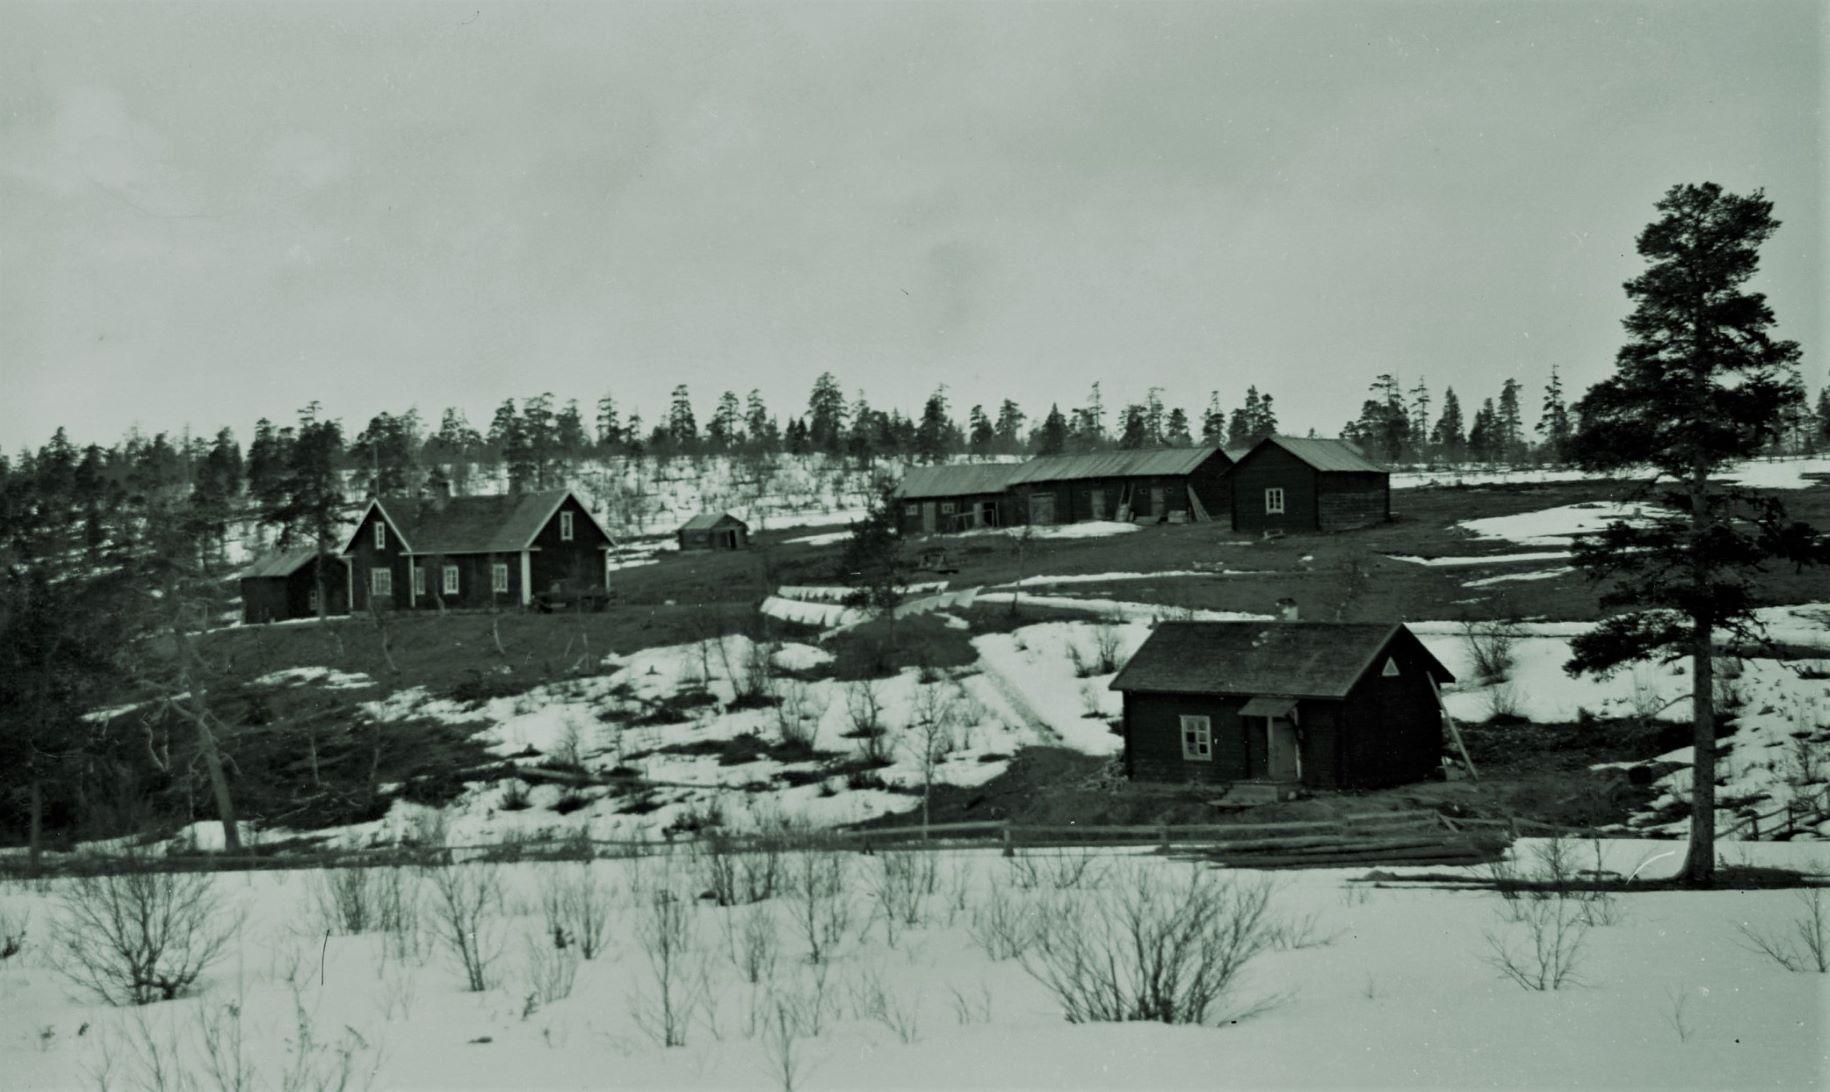 LAANILAN KIEVARI 1930